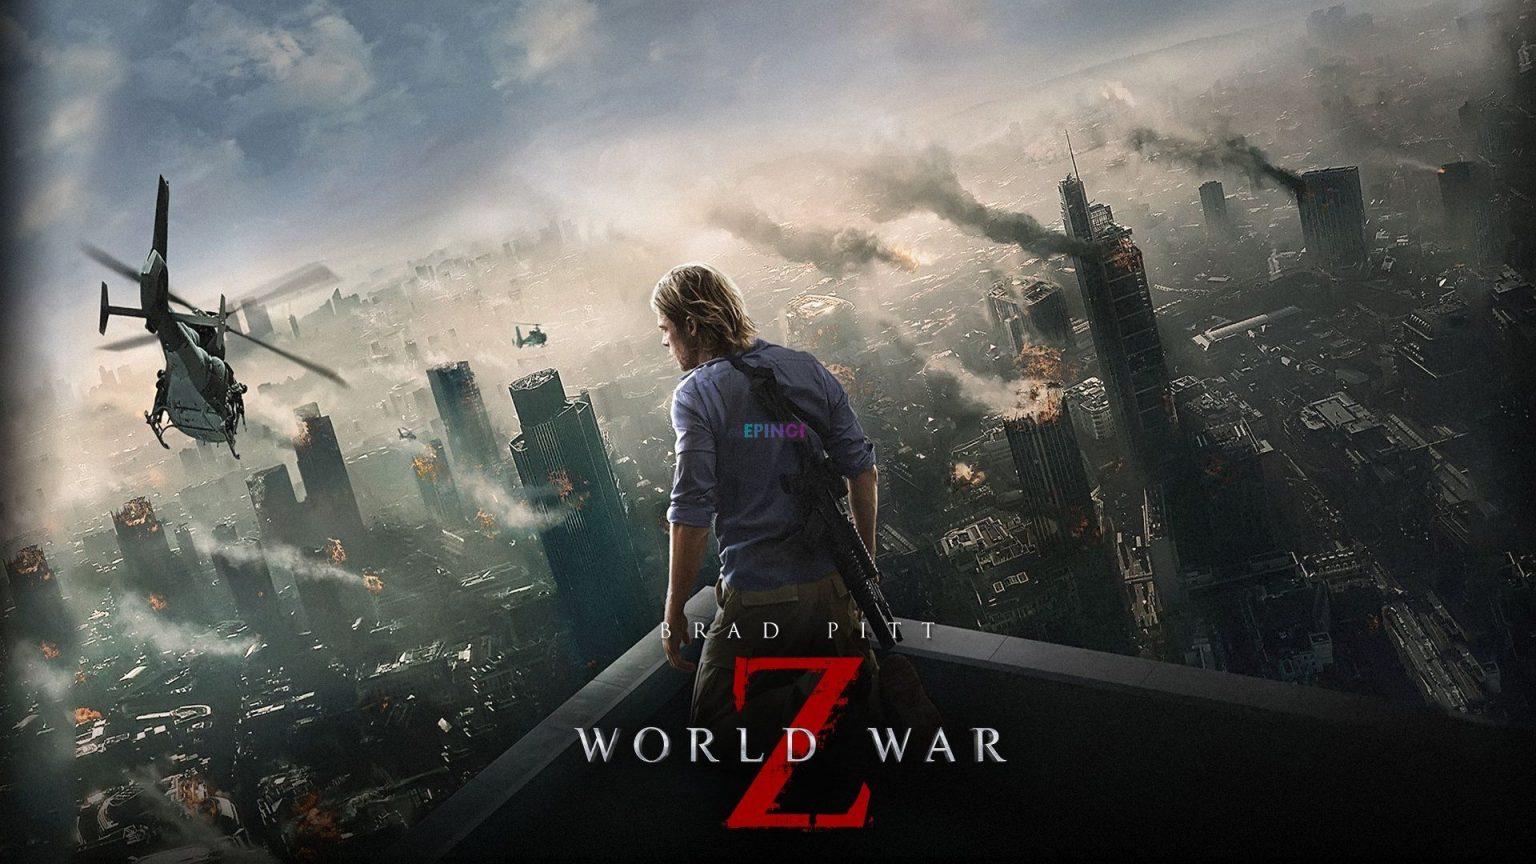 World War Z Unlocked Mobile Android Latest Version Cracked Version Download Online Multiplayer Torrent Free Game Setup Gaming Debates